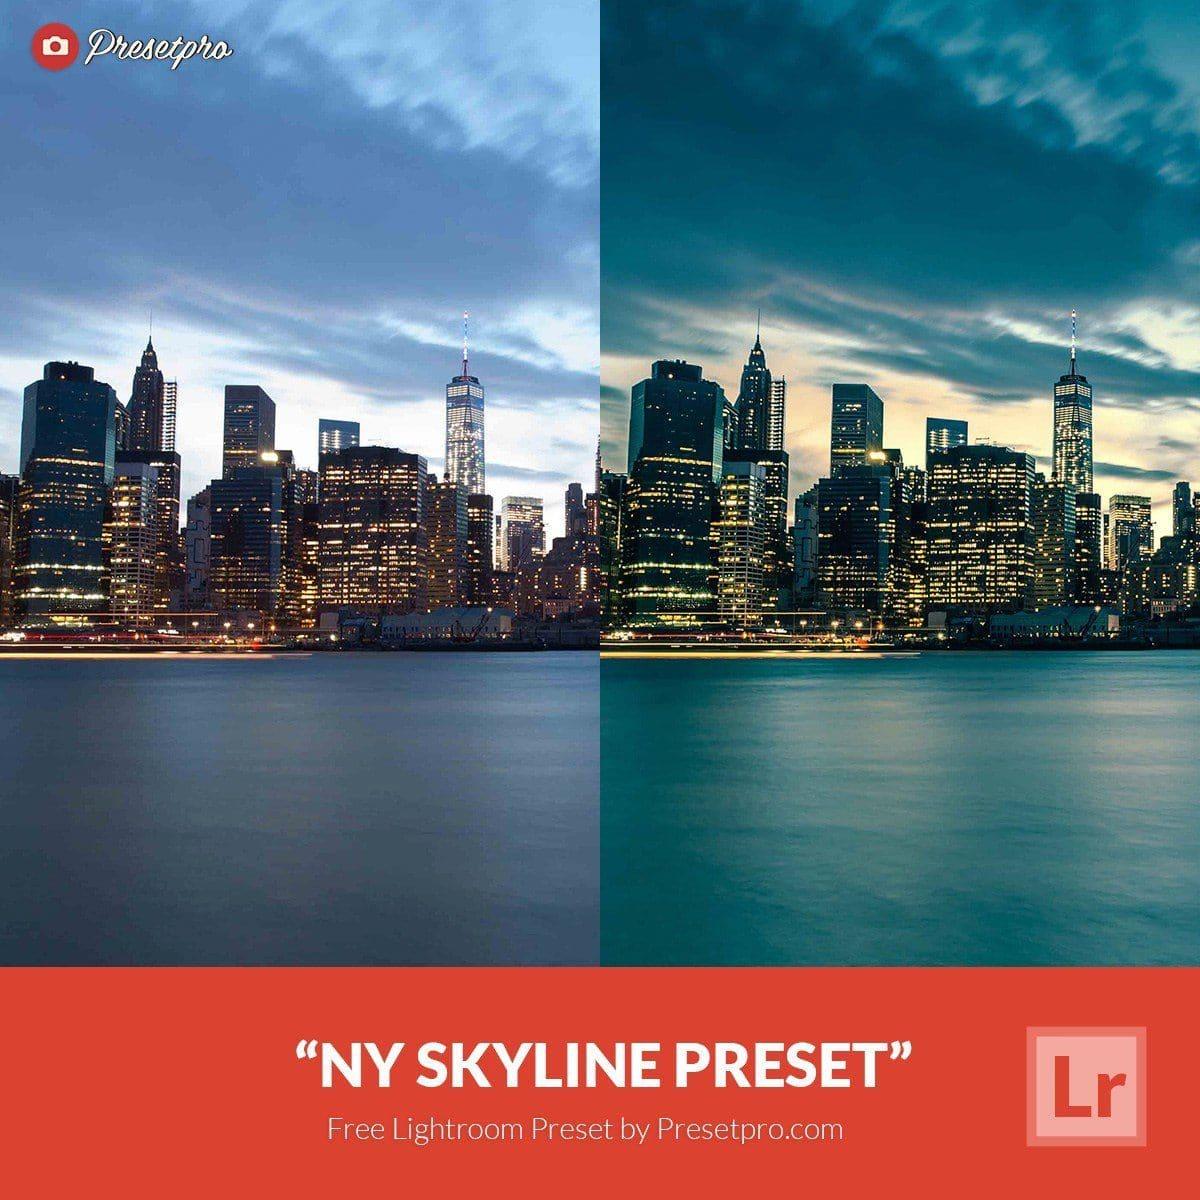 Free Lightroom Preset NY Skyline